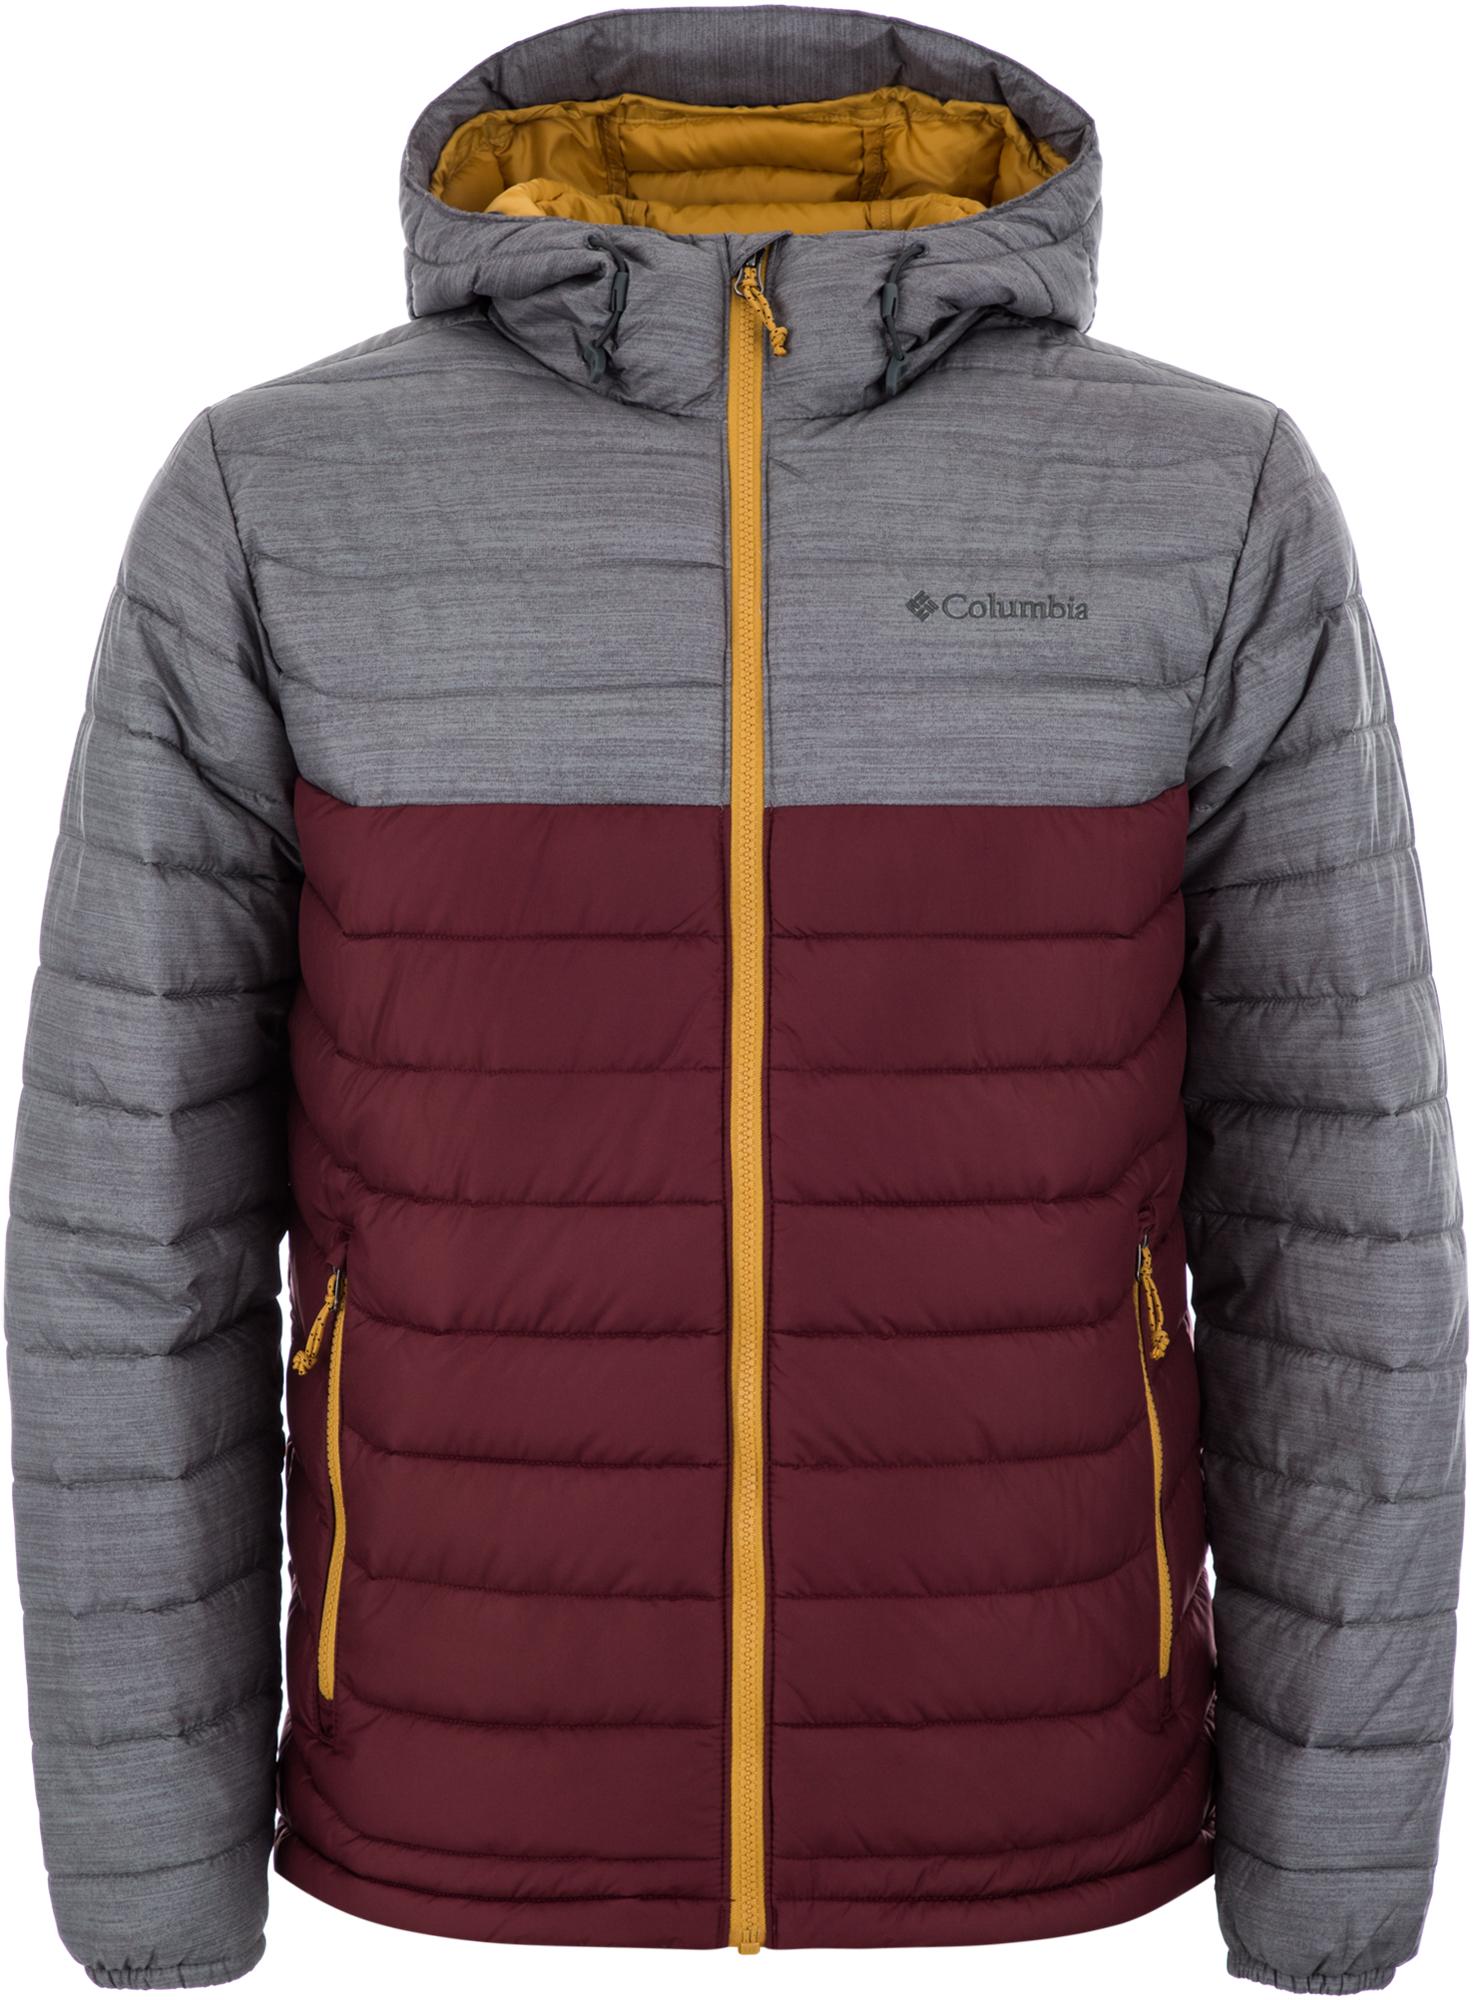 Columbia Куртка утепленная мужская Columbia Powder Lite, размер 56 цена и фото